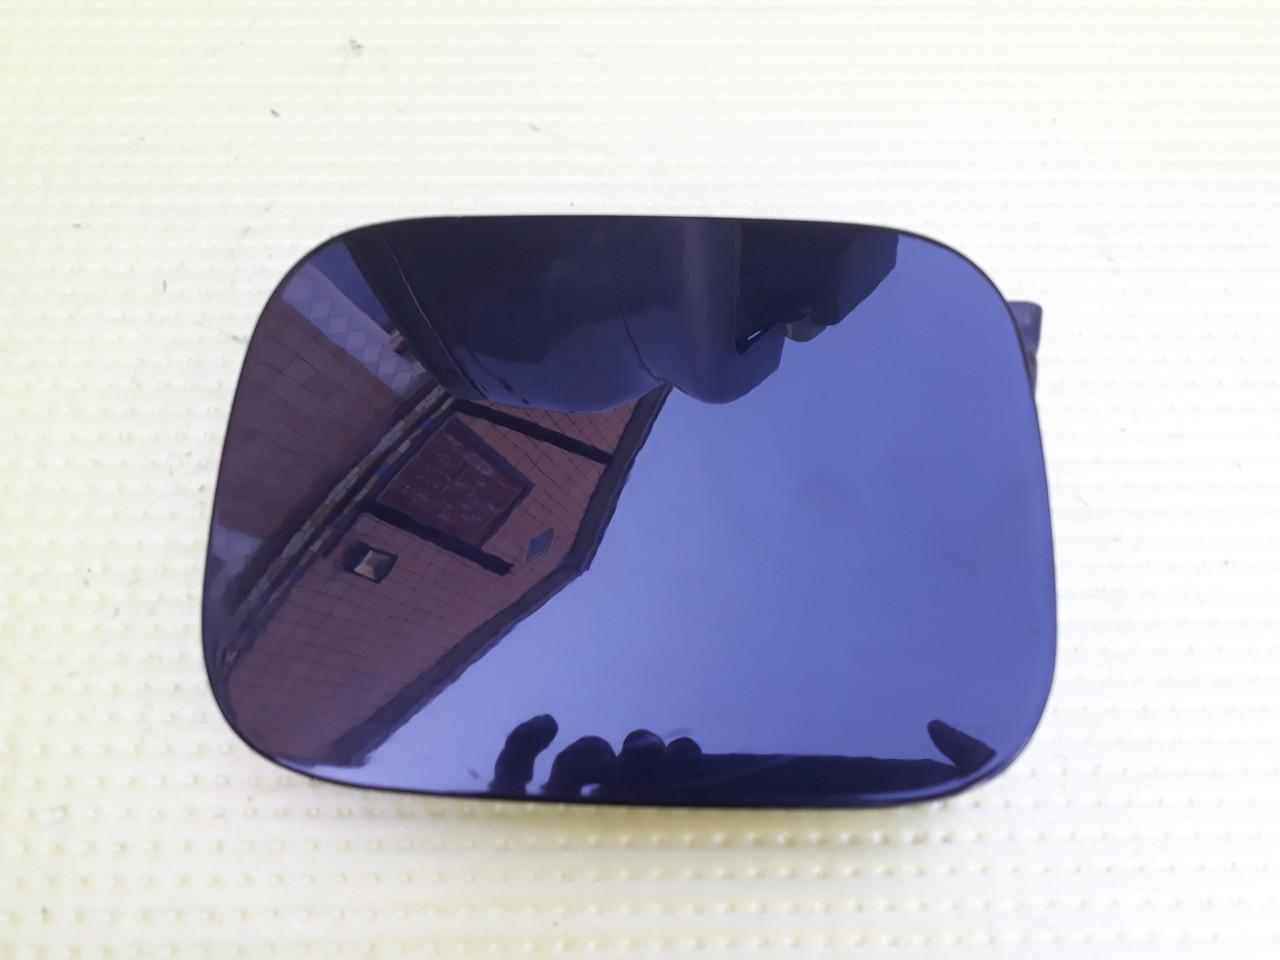 Лючок крышка бензобака бака ауди а6 с5 audi a6 c5 черный